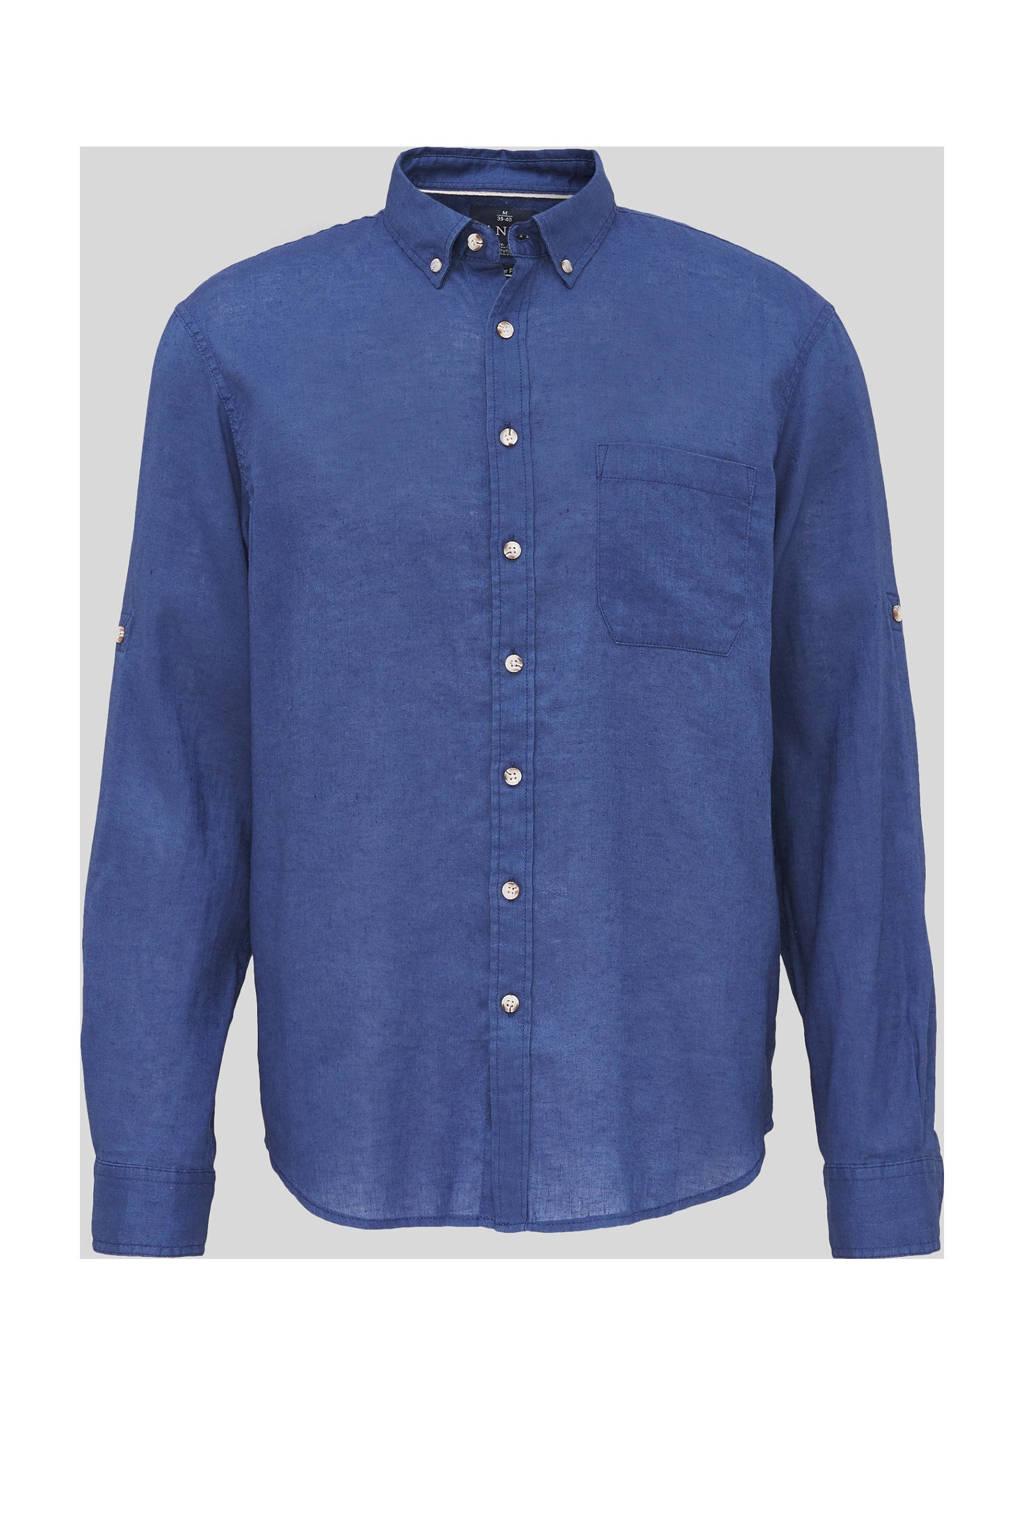 C&A Canda regular fit overhemd met linnen donkerblauw, Donkerblauw